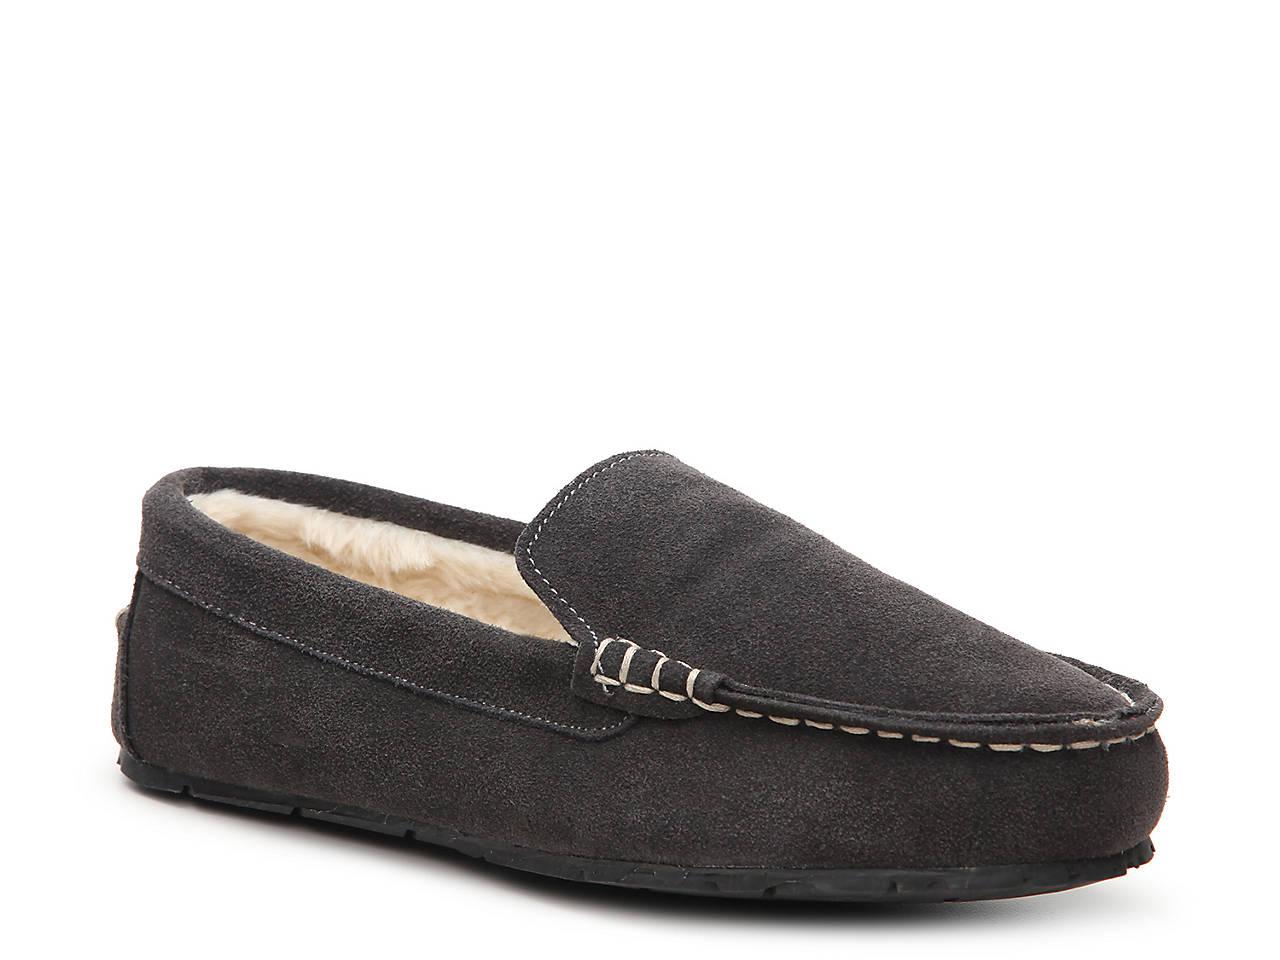 f11b1b81db083 Clarks Venetian Slipper Men s Shoes